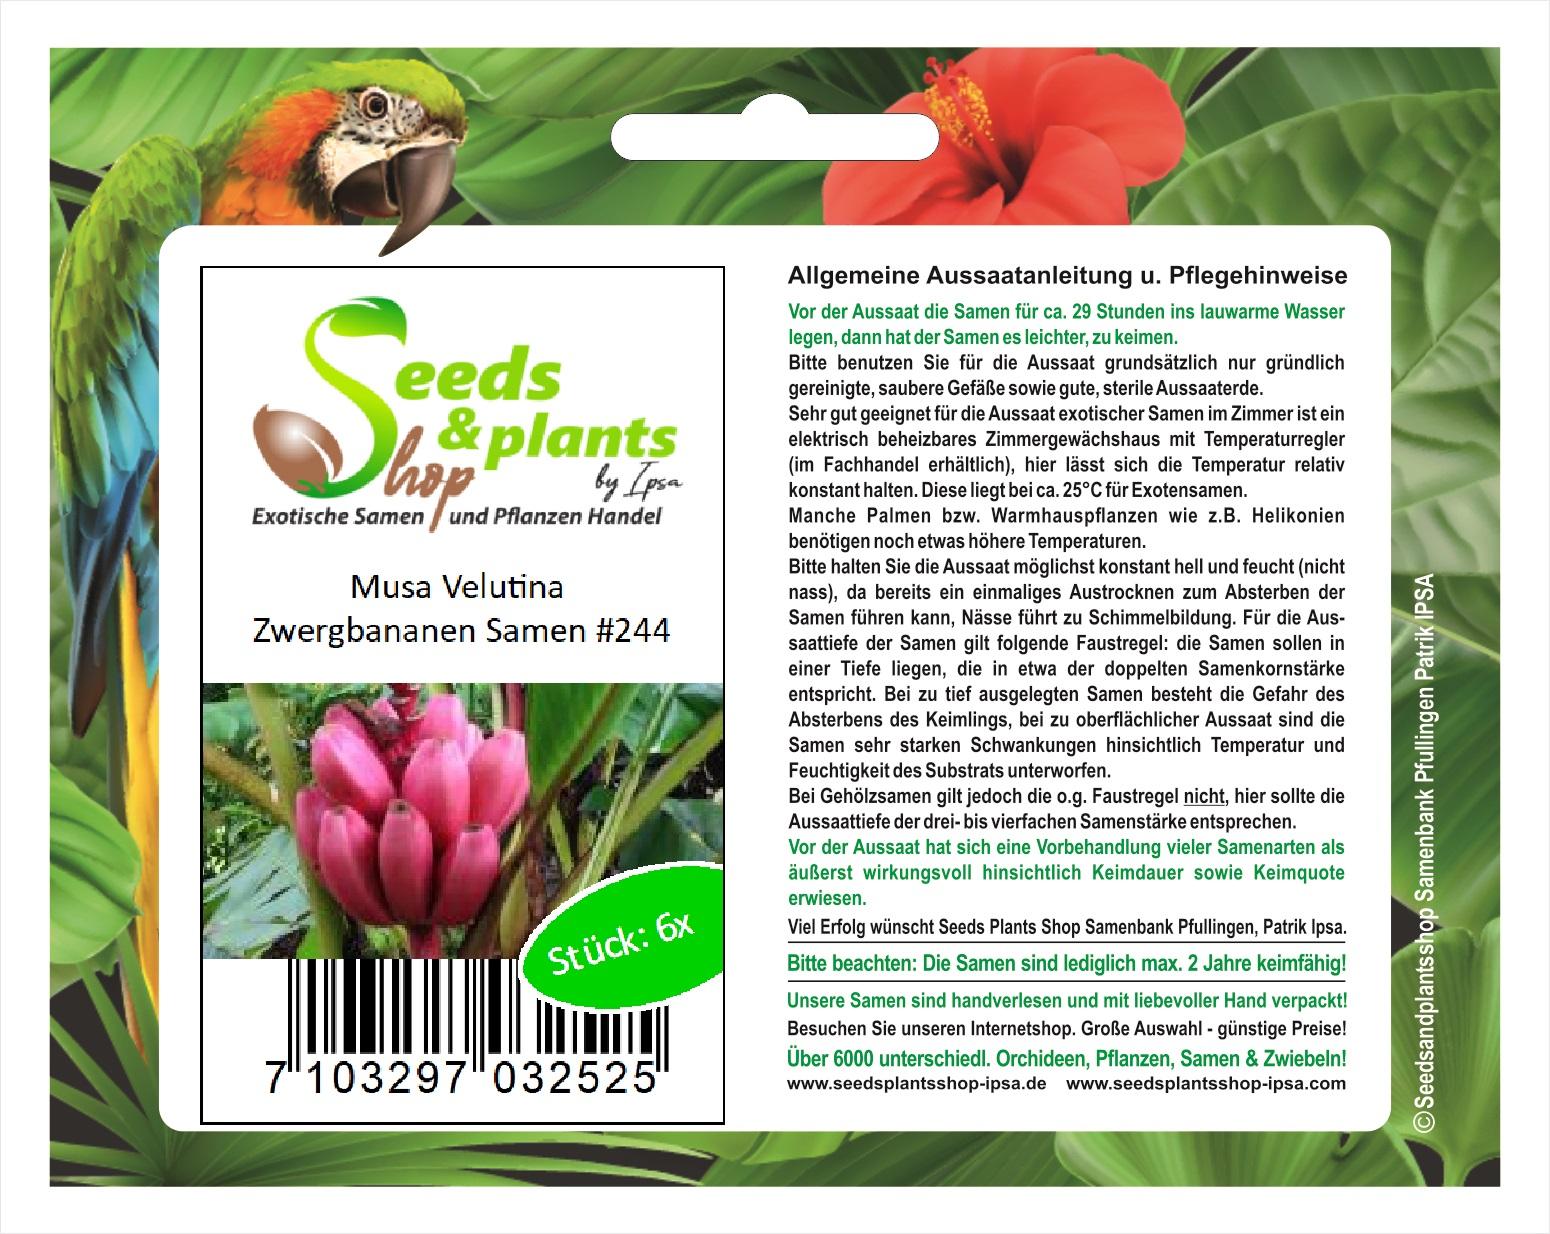 Stk Seeds Plants Shop Samenbank Pfullingen Patrik Ipsa Samen #244 6x Musa Velutina Zwergbananen Obst Pflanzen